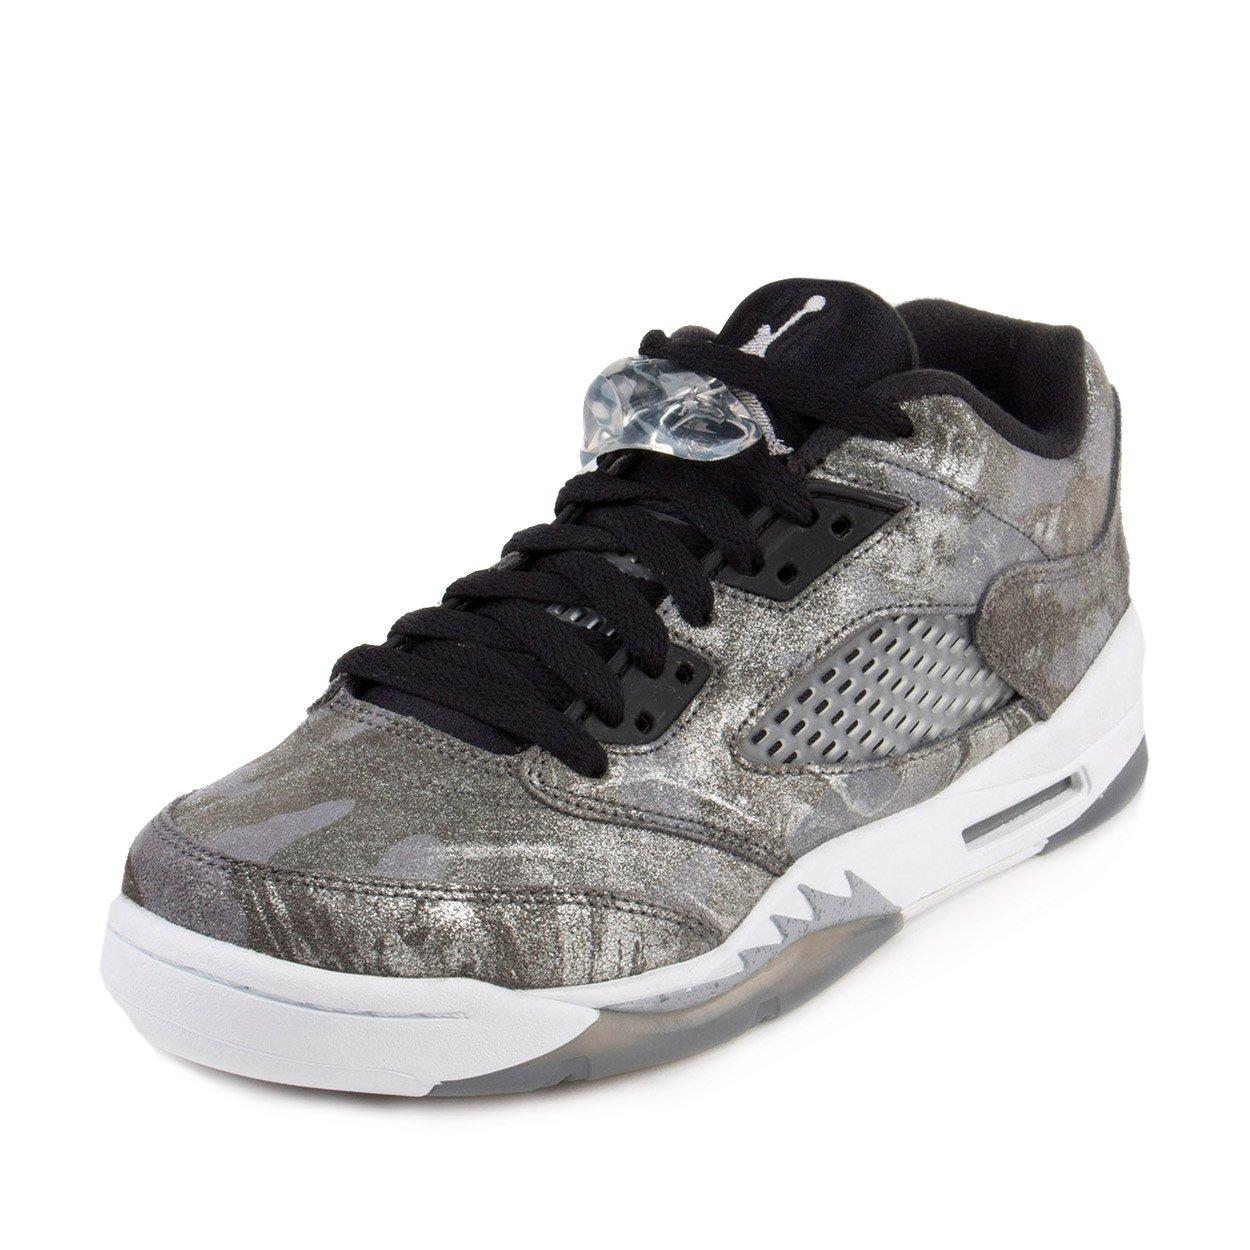 Nike Air Jordan 5 Retro PREM Low GG Cool Grey/Wolf Grey/White/Black Leather Size 5y